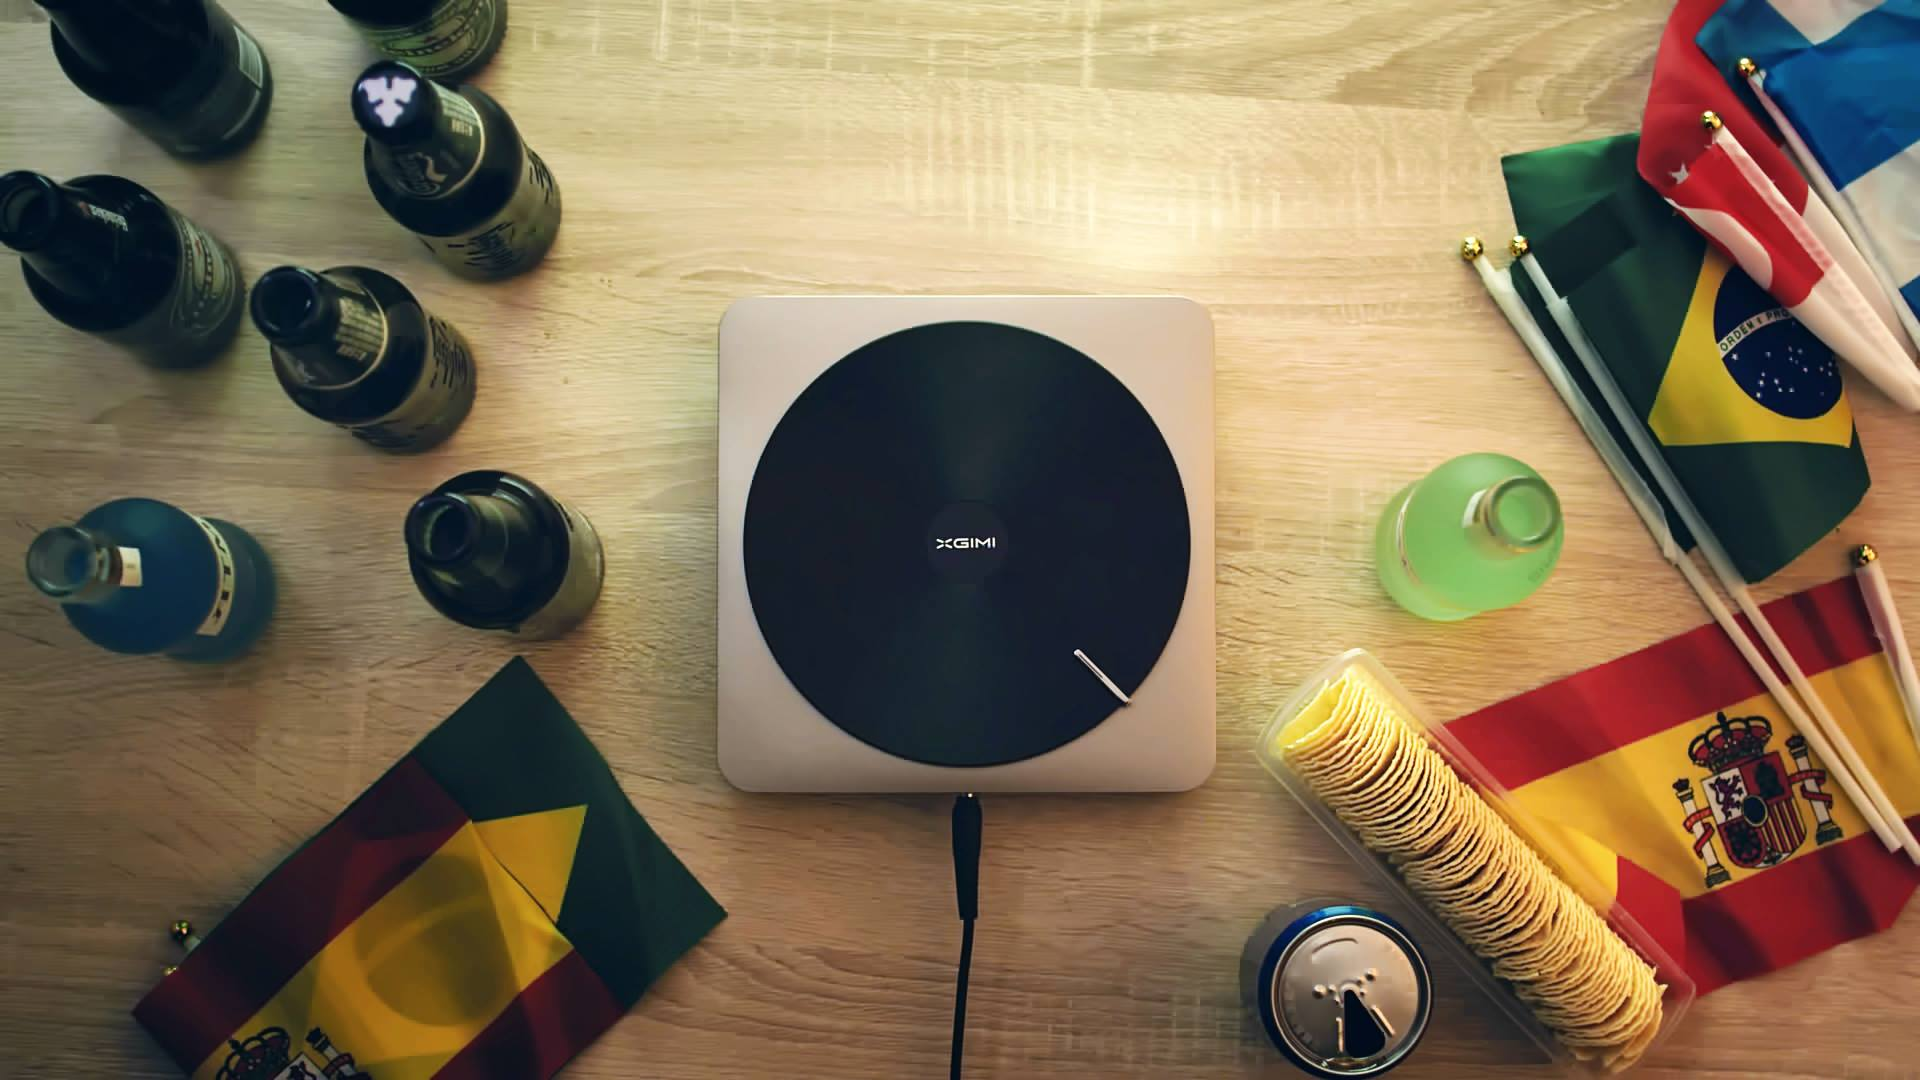 xgimi Z4 aurora video projecteur indiegogo crowdfunding 4k home